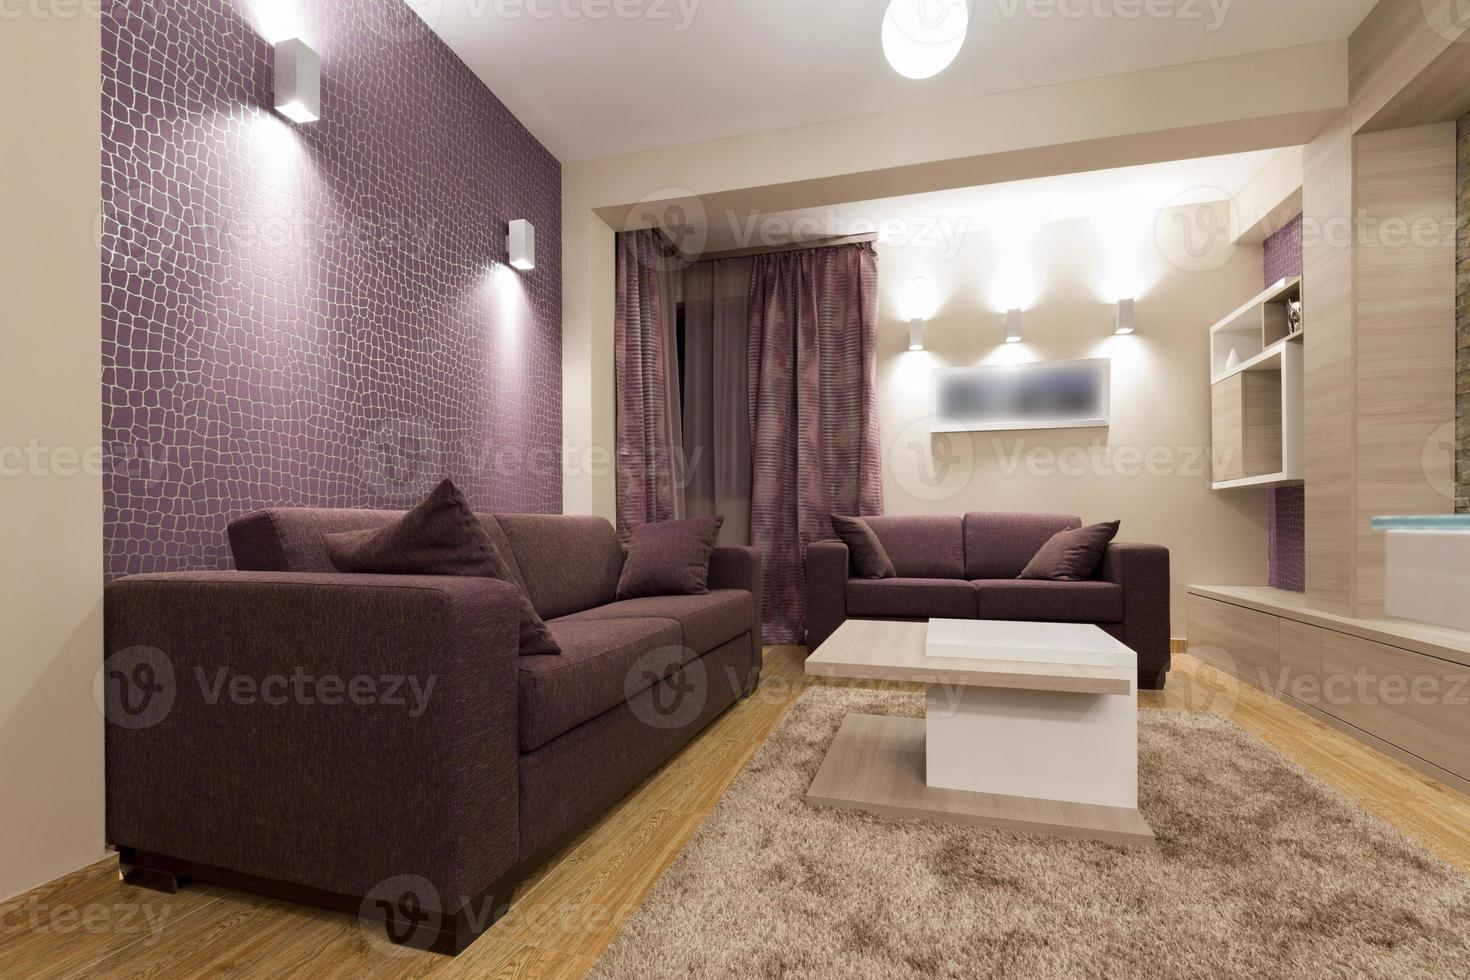 interior de apartamento de lujo moderno foto